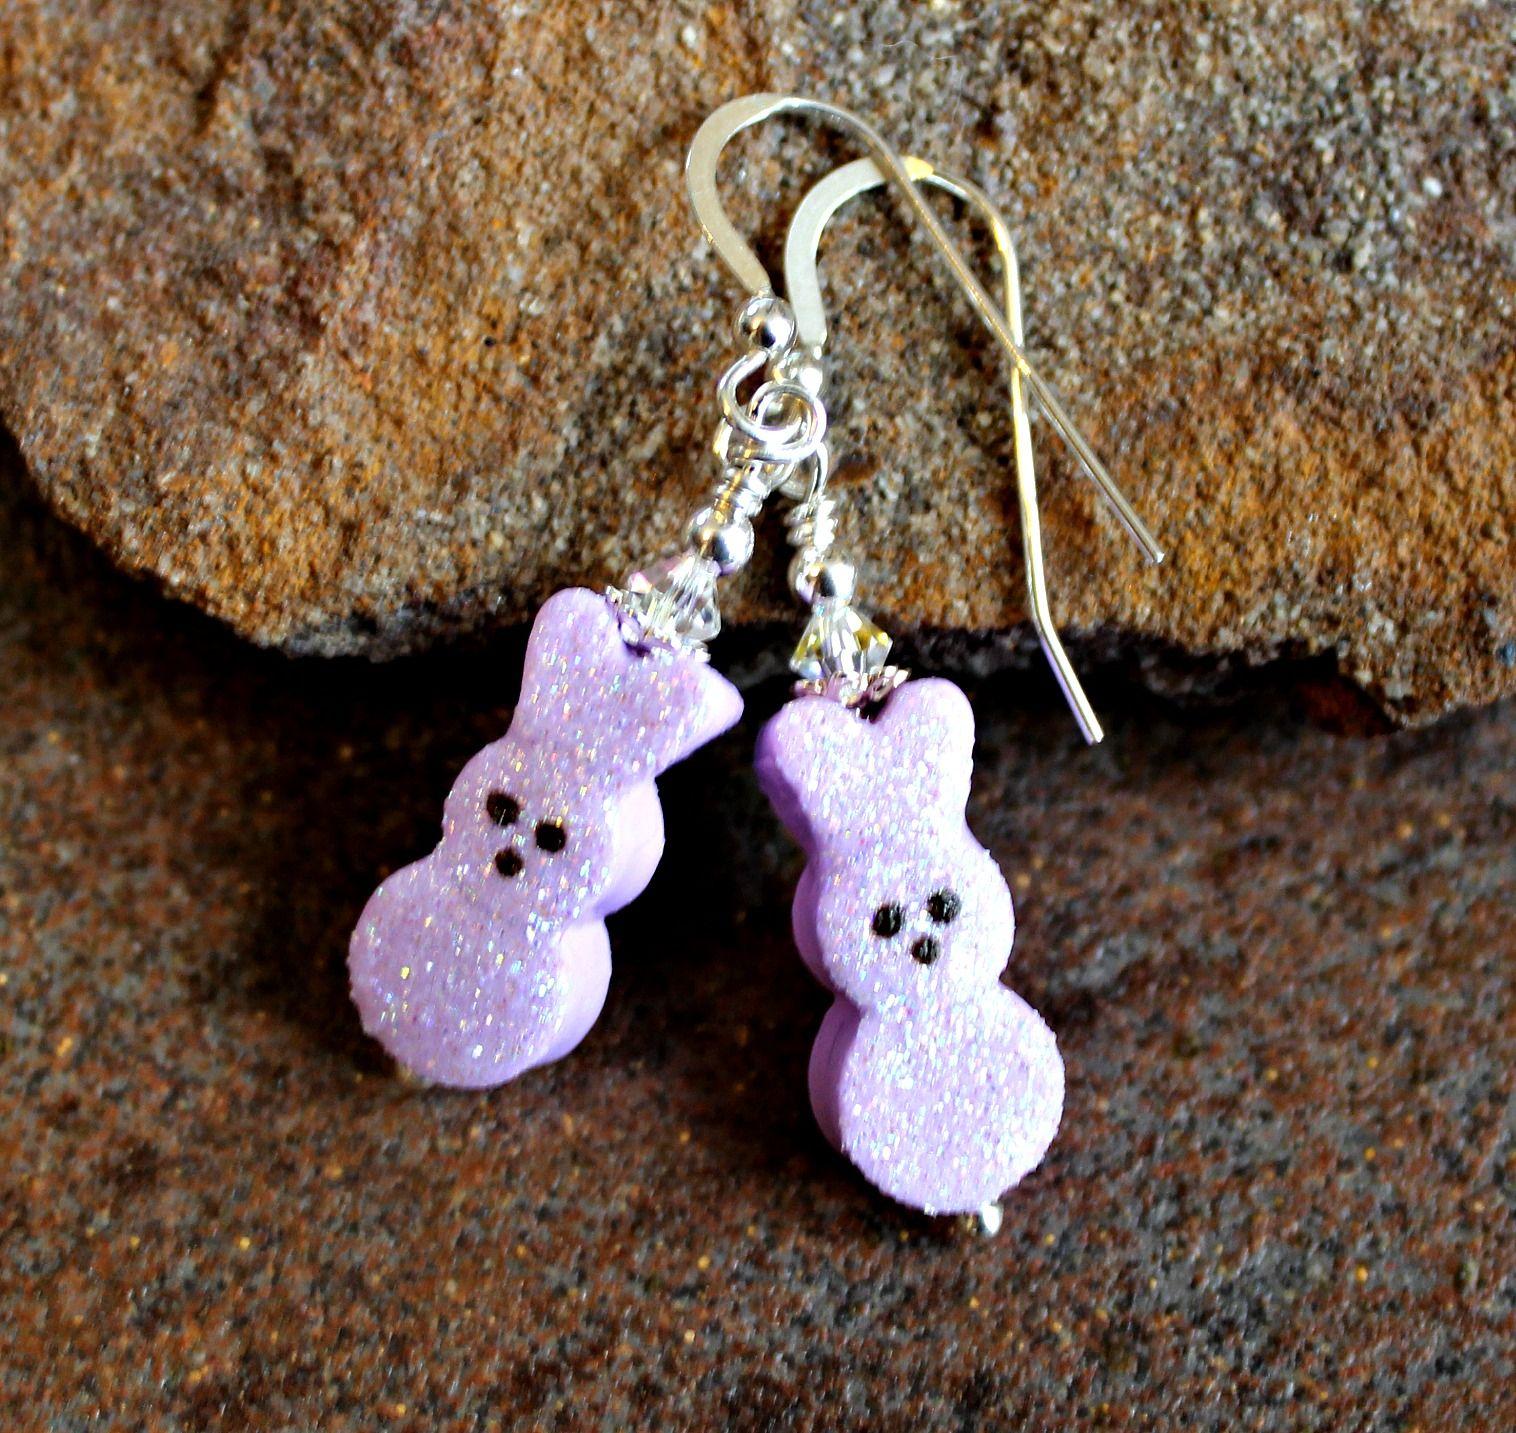 Easter Bunny Earrings Sterling Silver Easter Bunny Earrings Diy